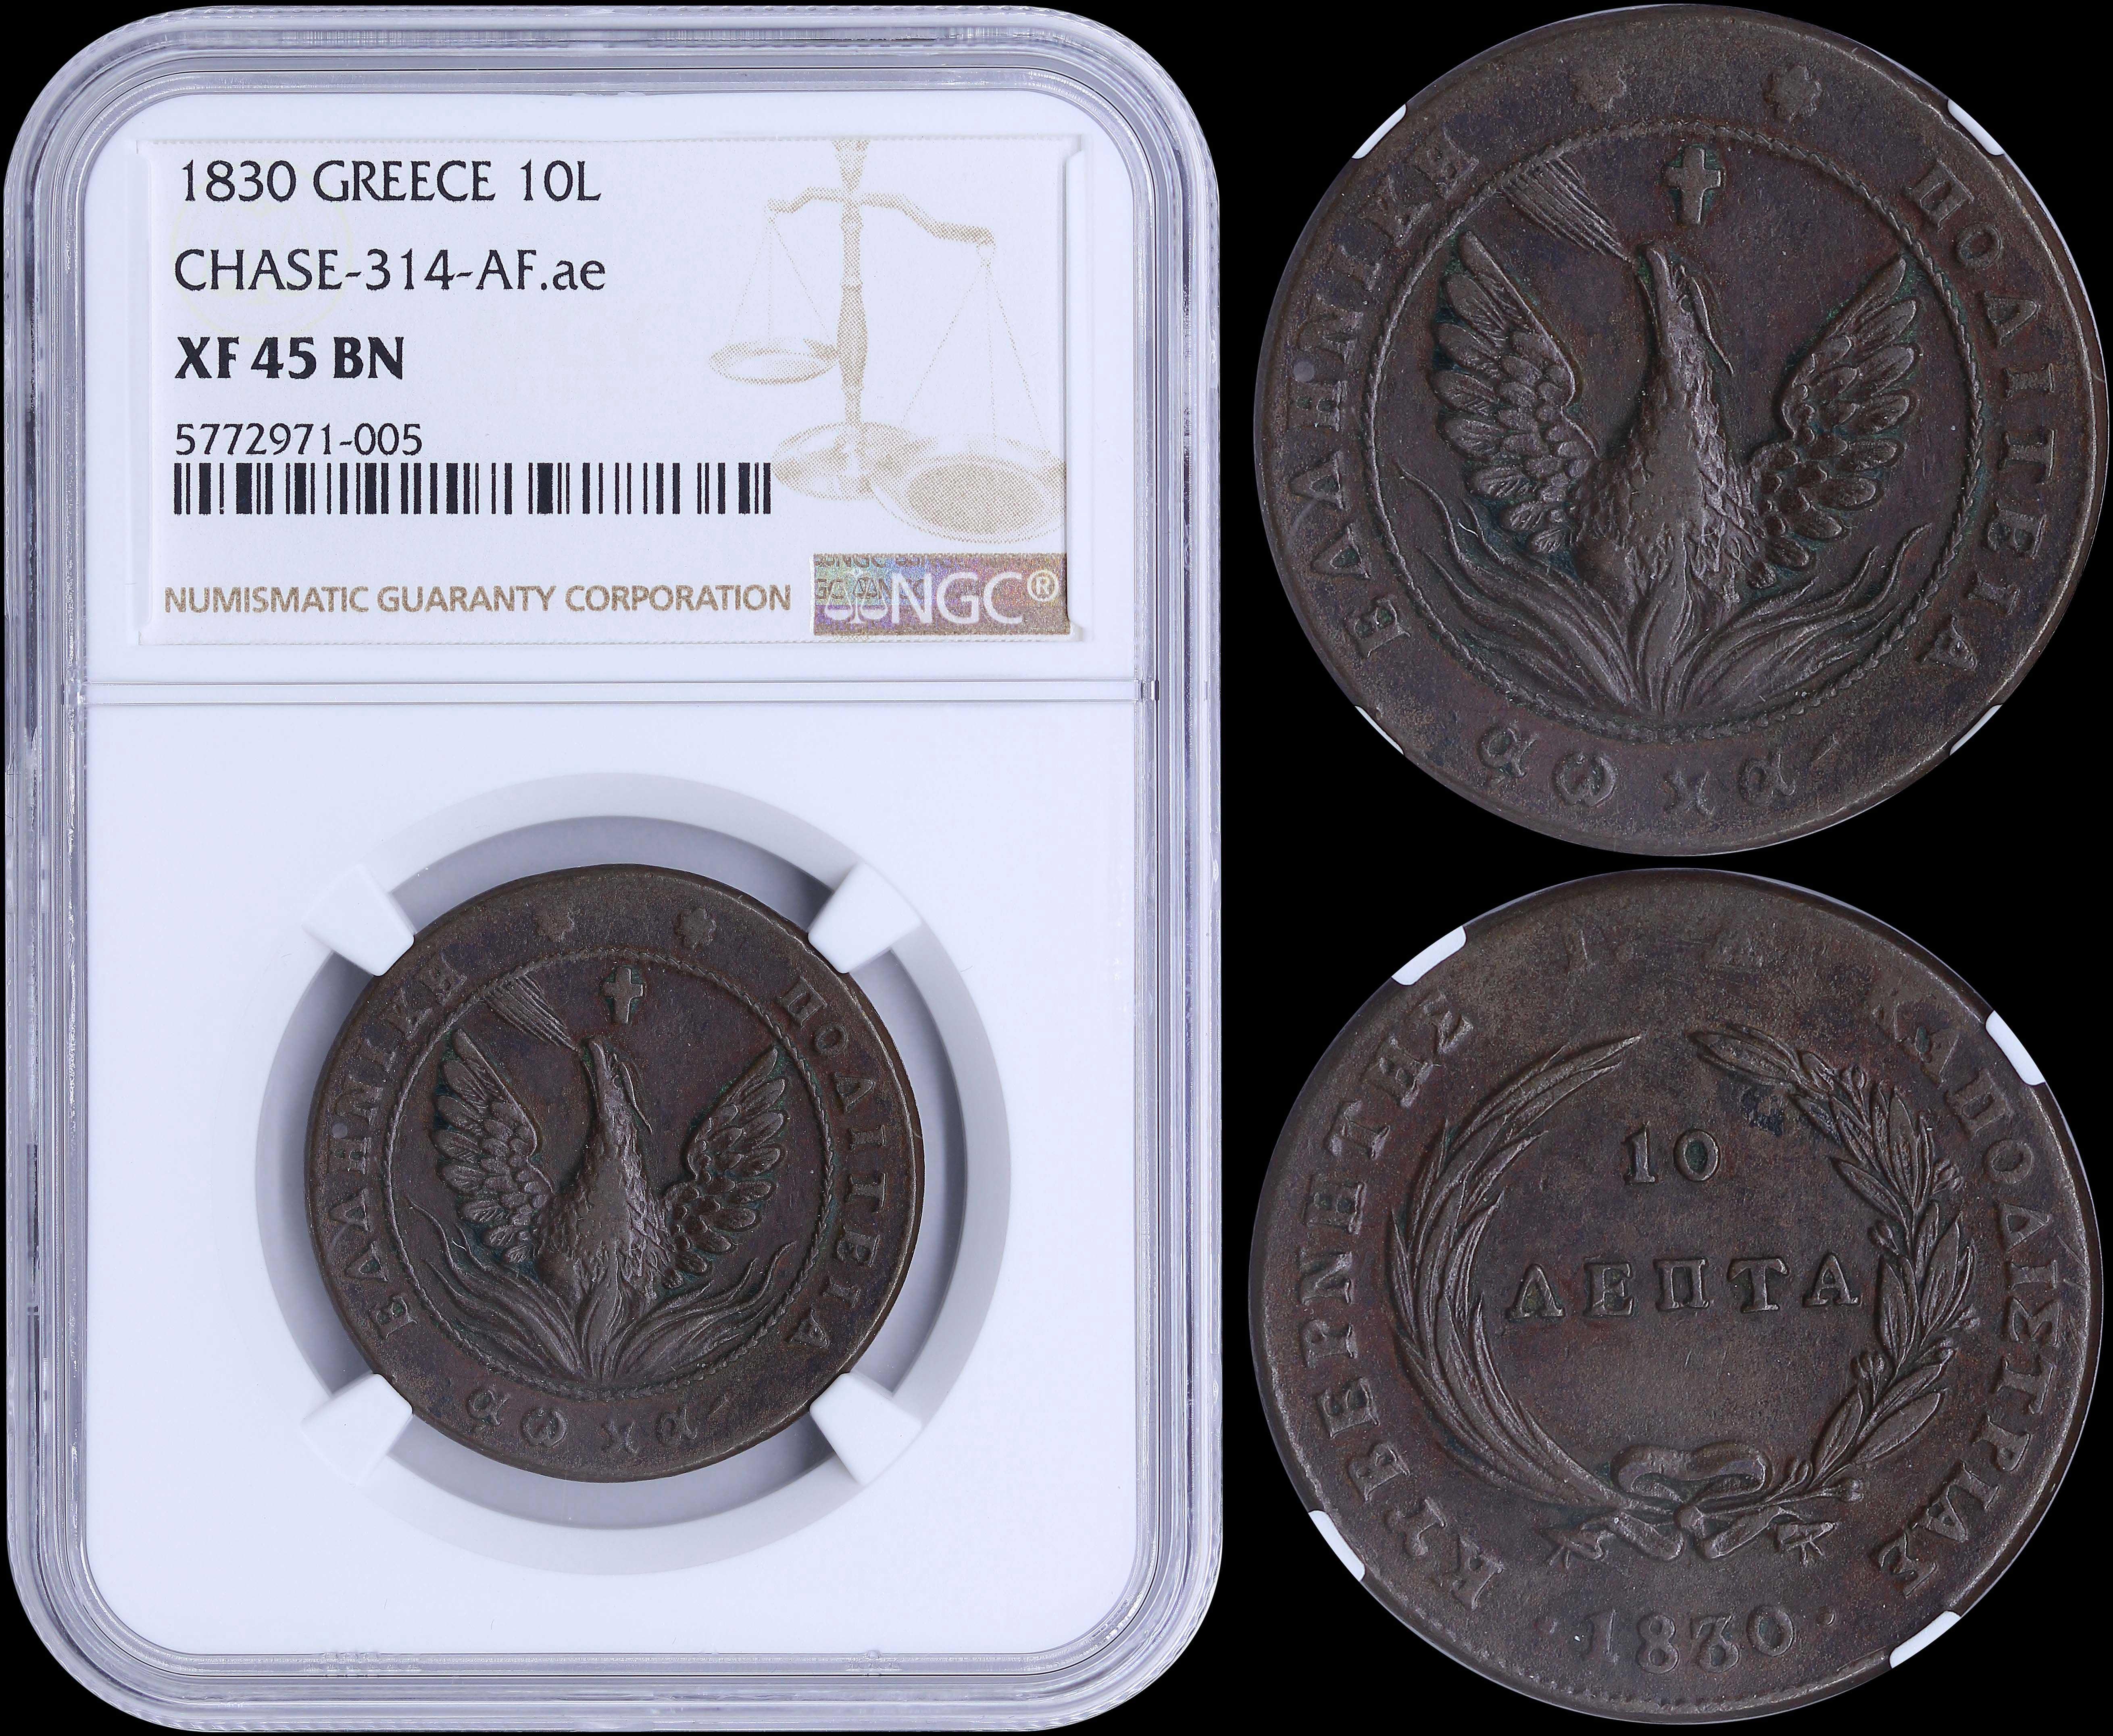 Lot 6019 - -  COINS & TOKENS governor capodistrias -  A. Karamitsos Public & Live Internet Auction 682 (Part A) Coins, Medals & Banknotes